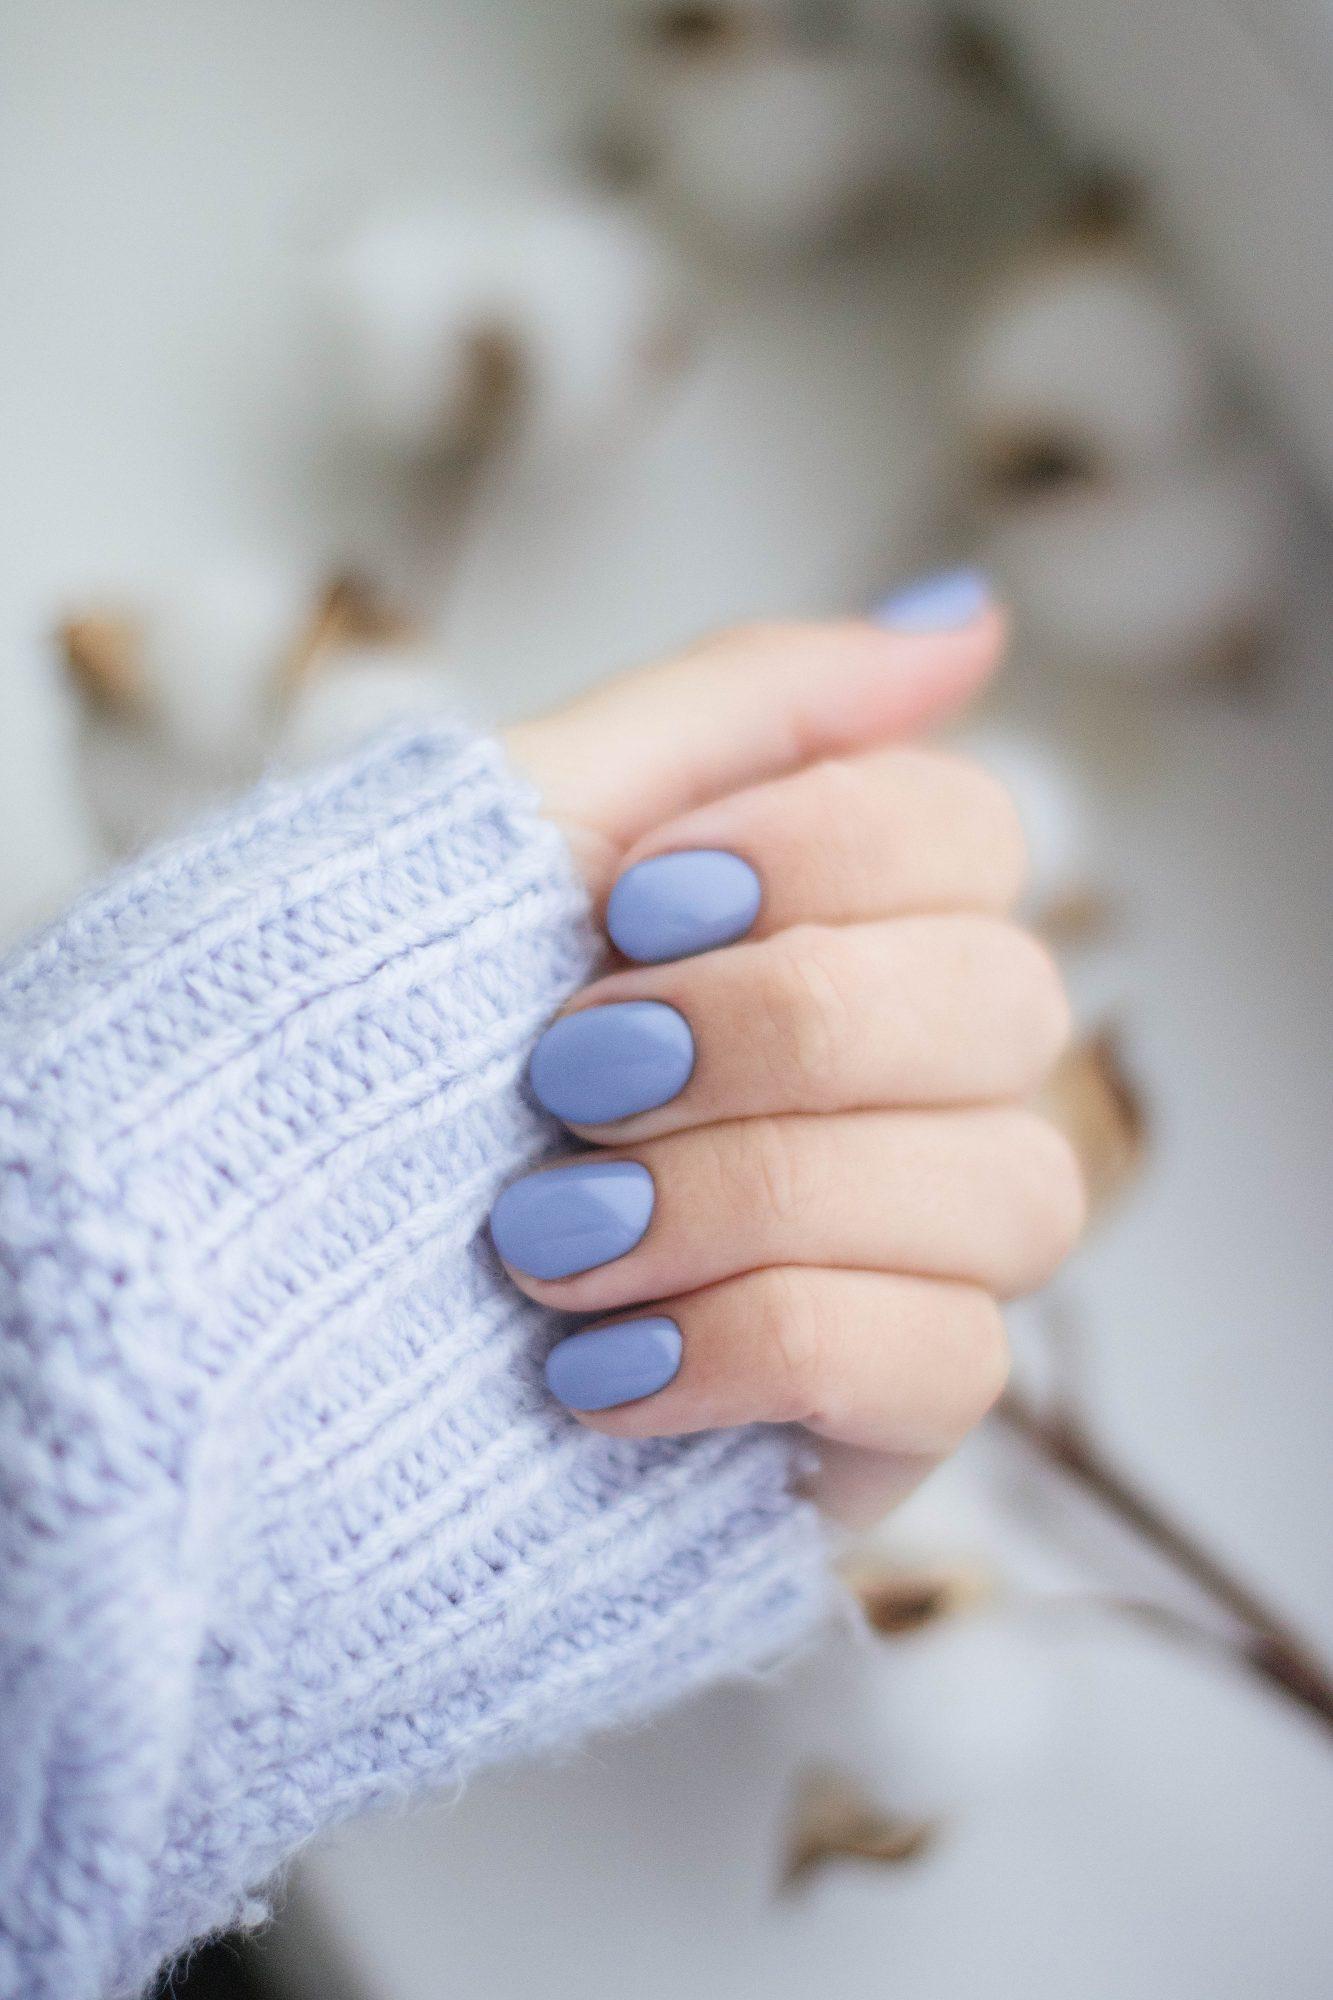 quit-biting-nails.jpg